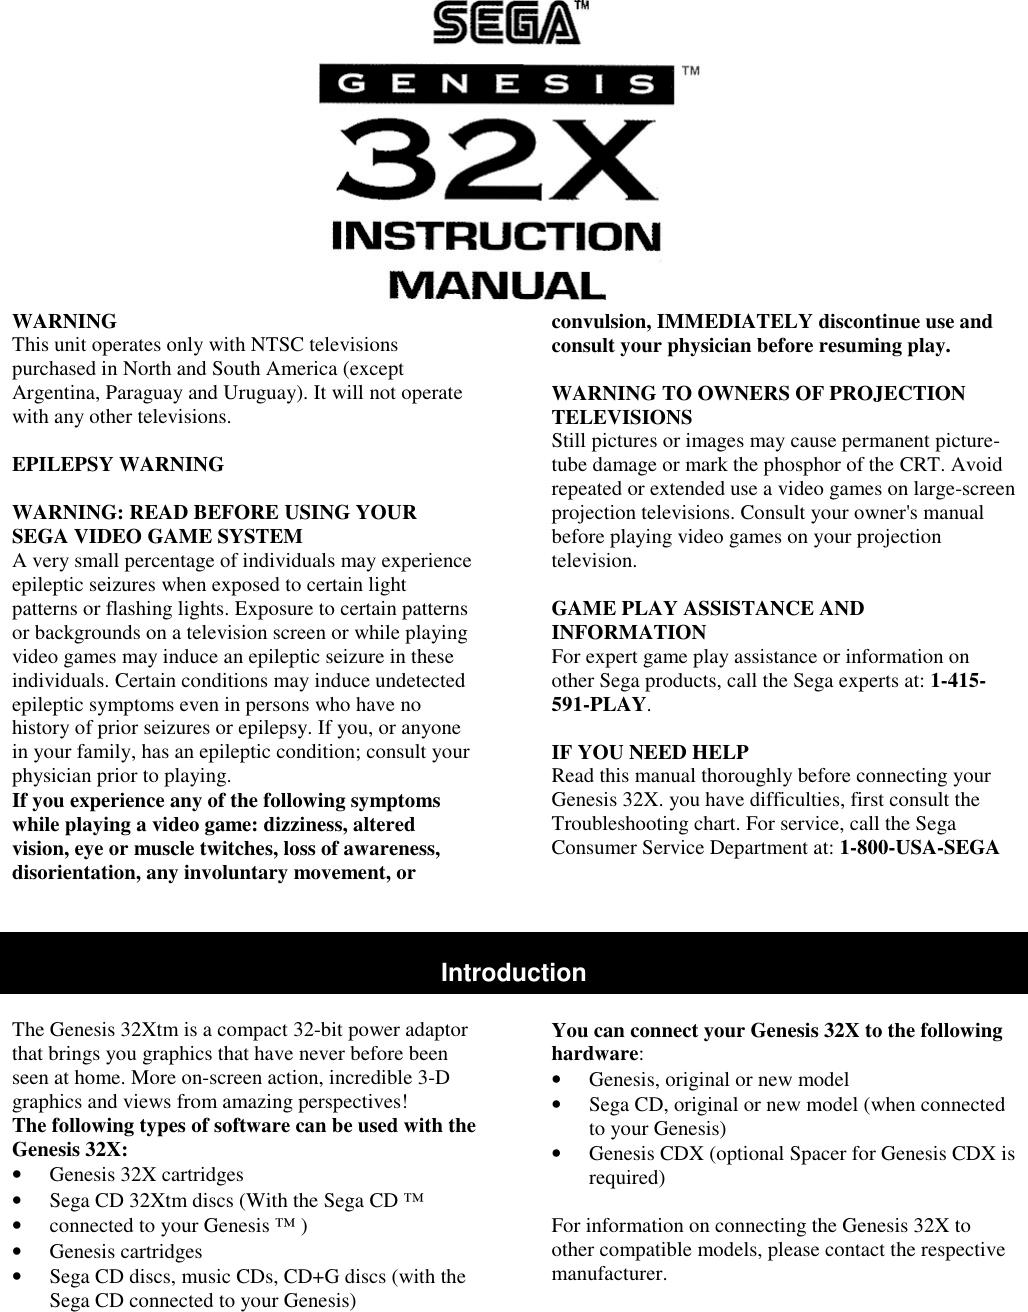 sega genesis 32x instruction manual rh usermanual wiki sega genesis manuals pdf sega genesis manuals for sale